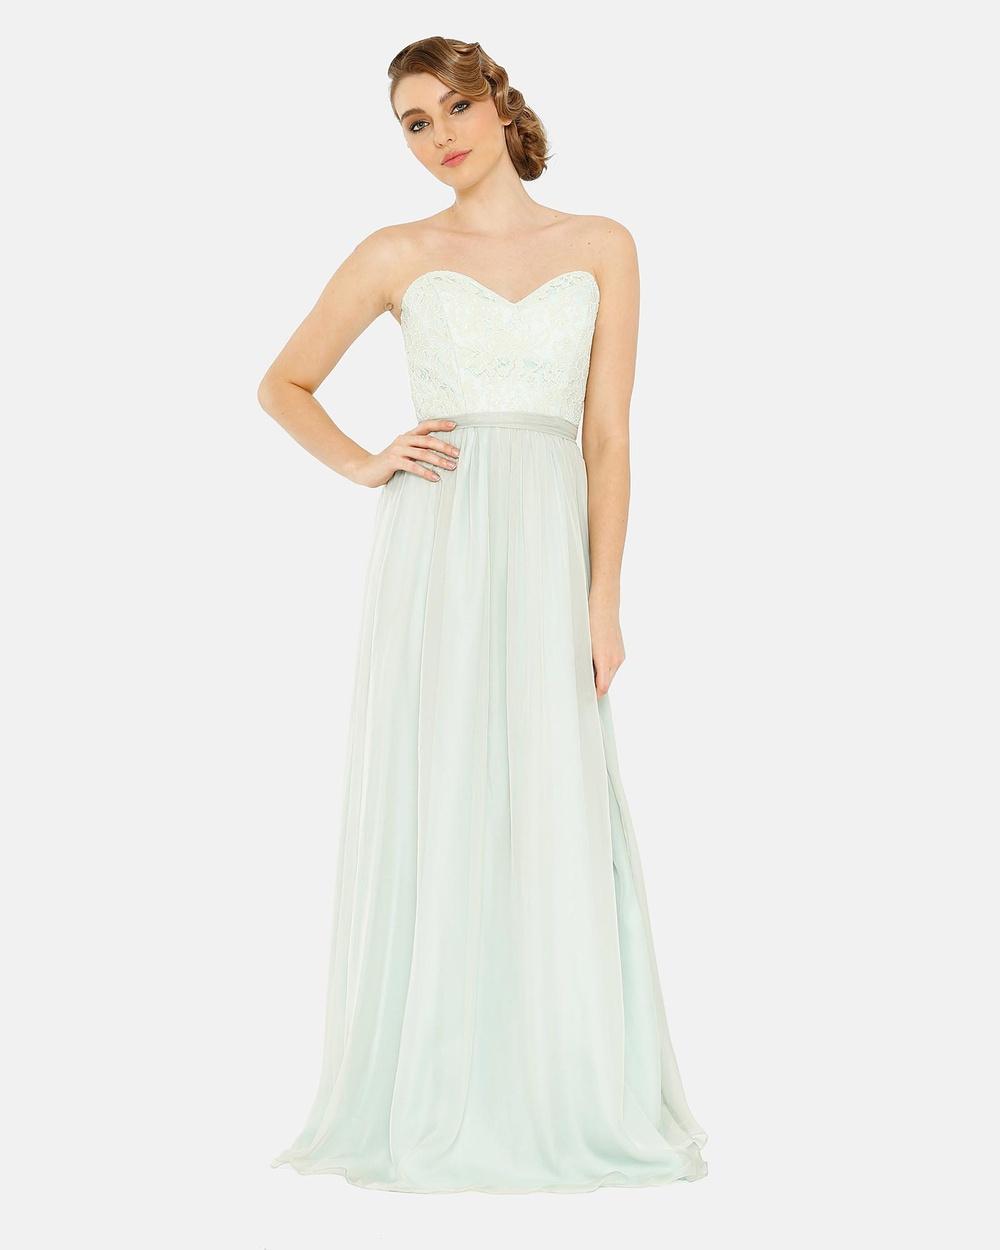 Tania Olsen Designs Chantelle Dress Bridesmaid Dresses Mint Chantelle Dress